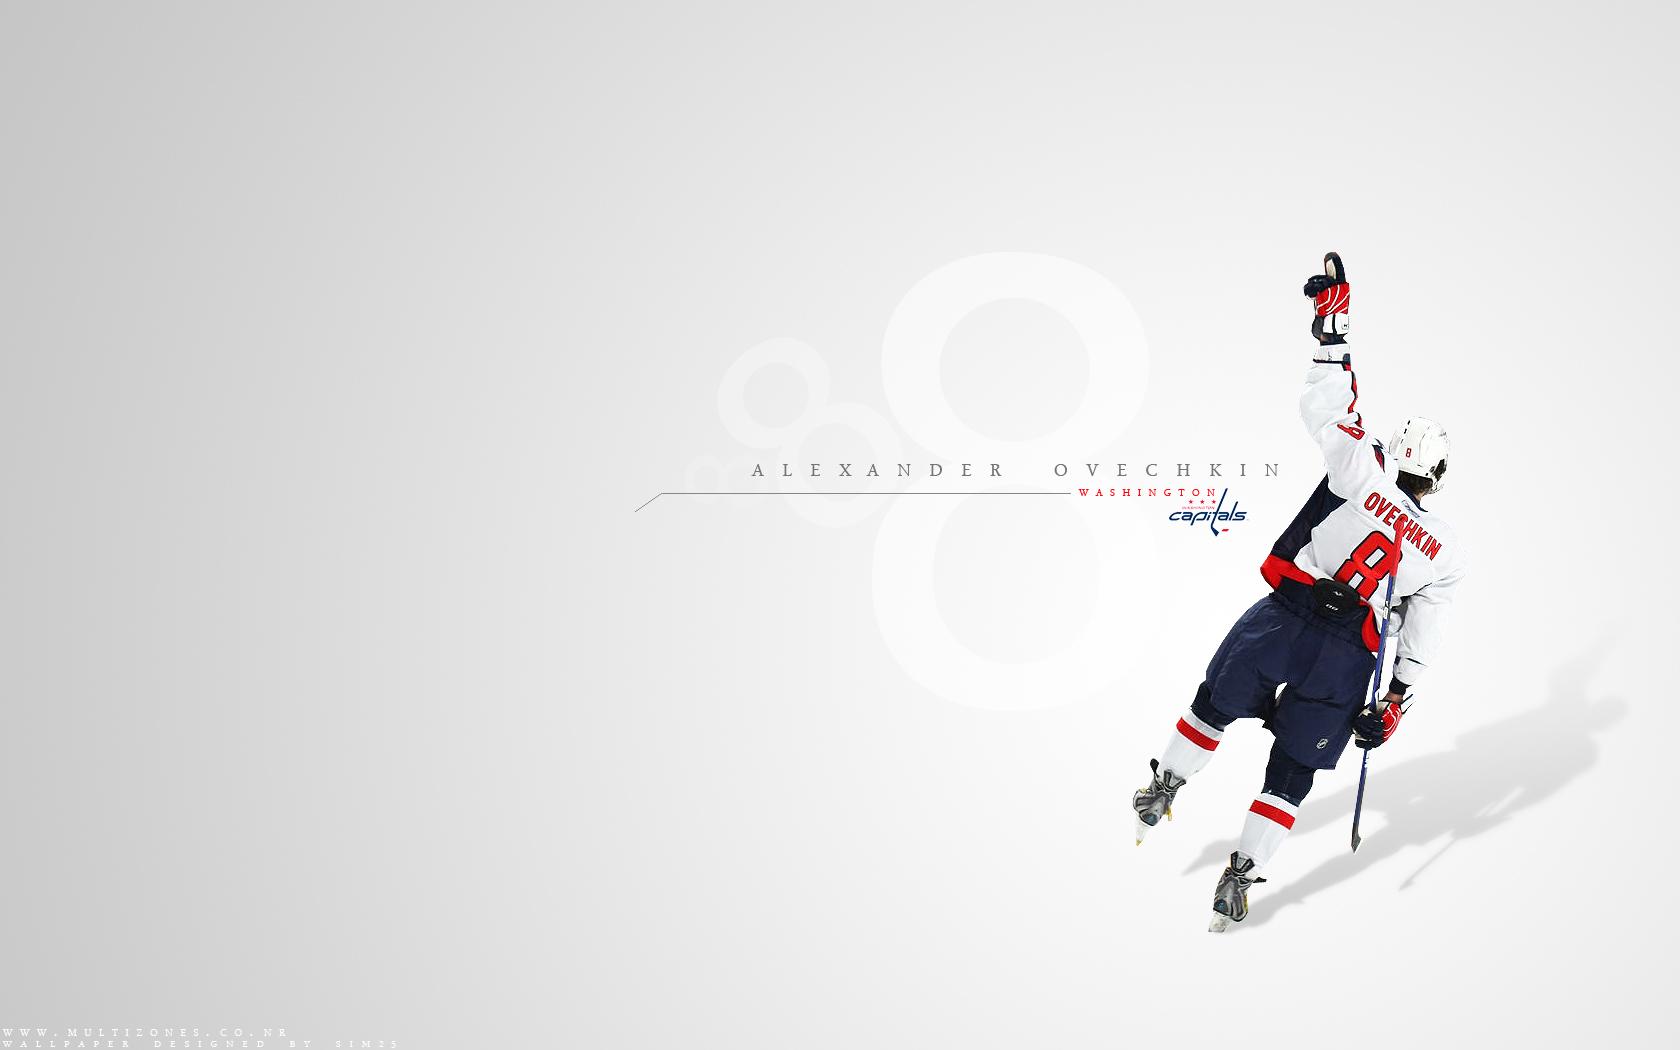 Alexander Ovechkin NHL Hockey Washington Capitals wallpaper background 1680x1050